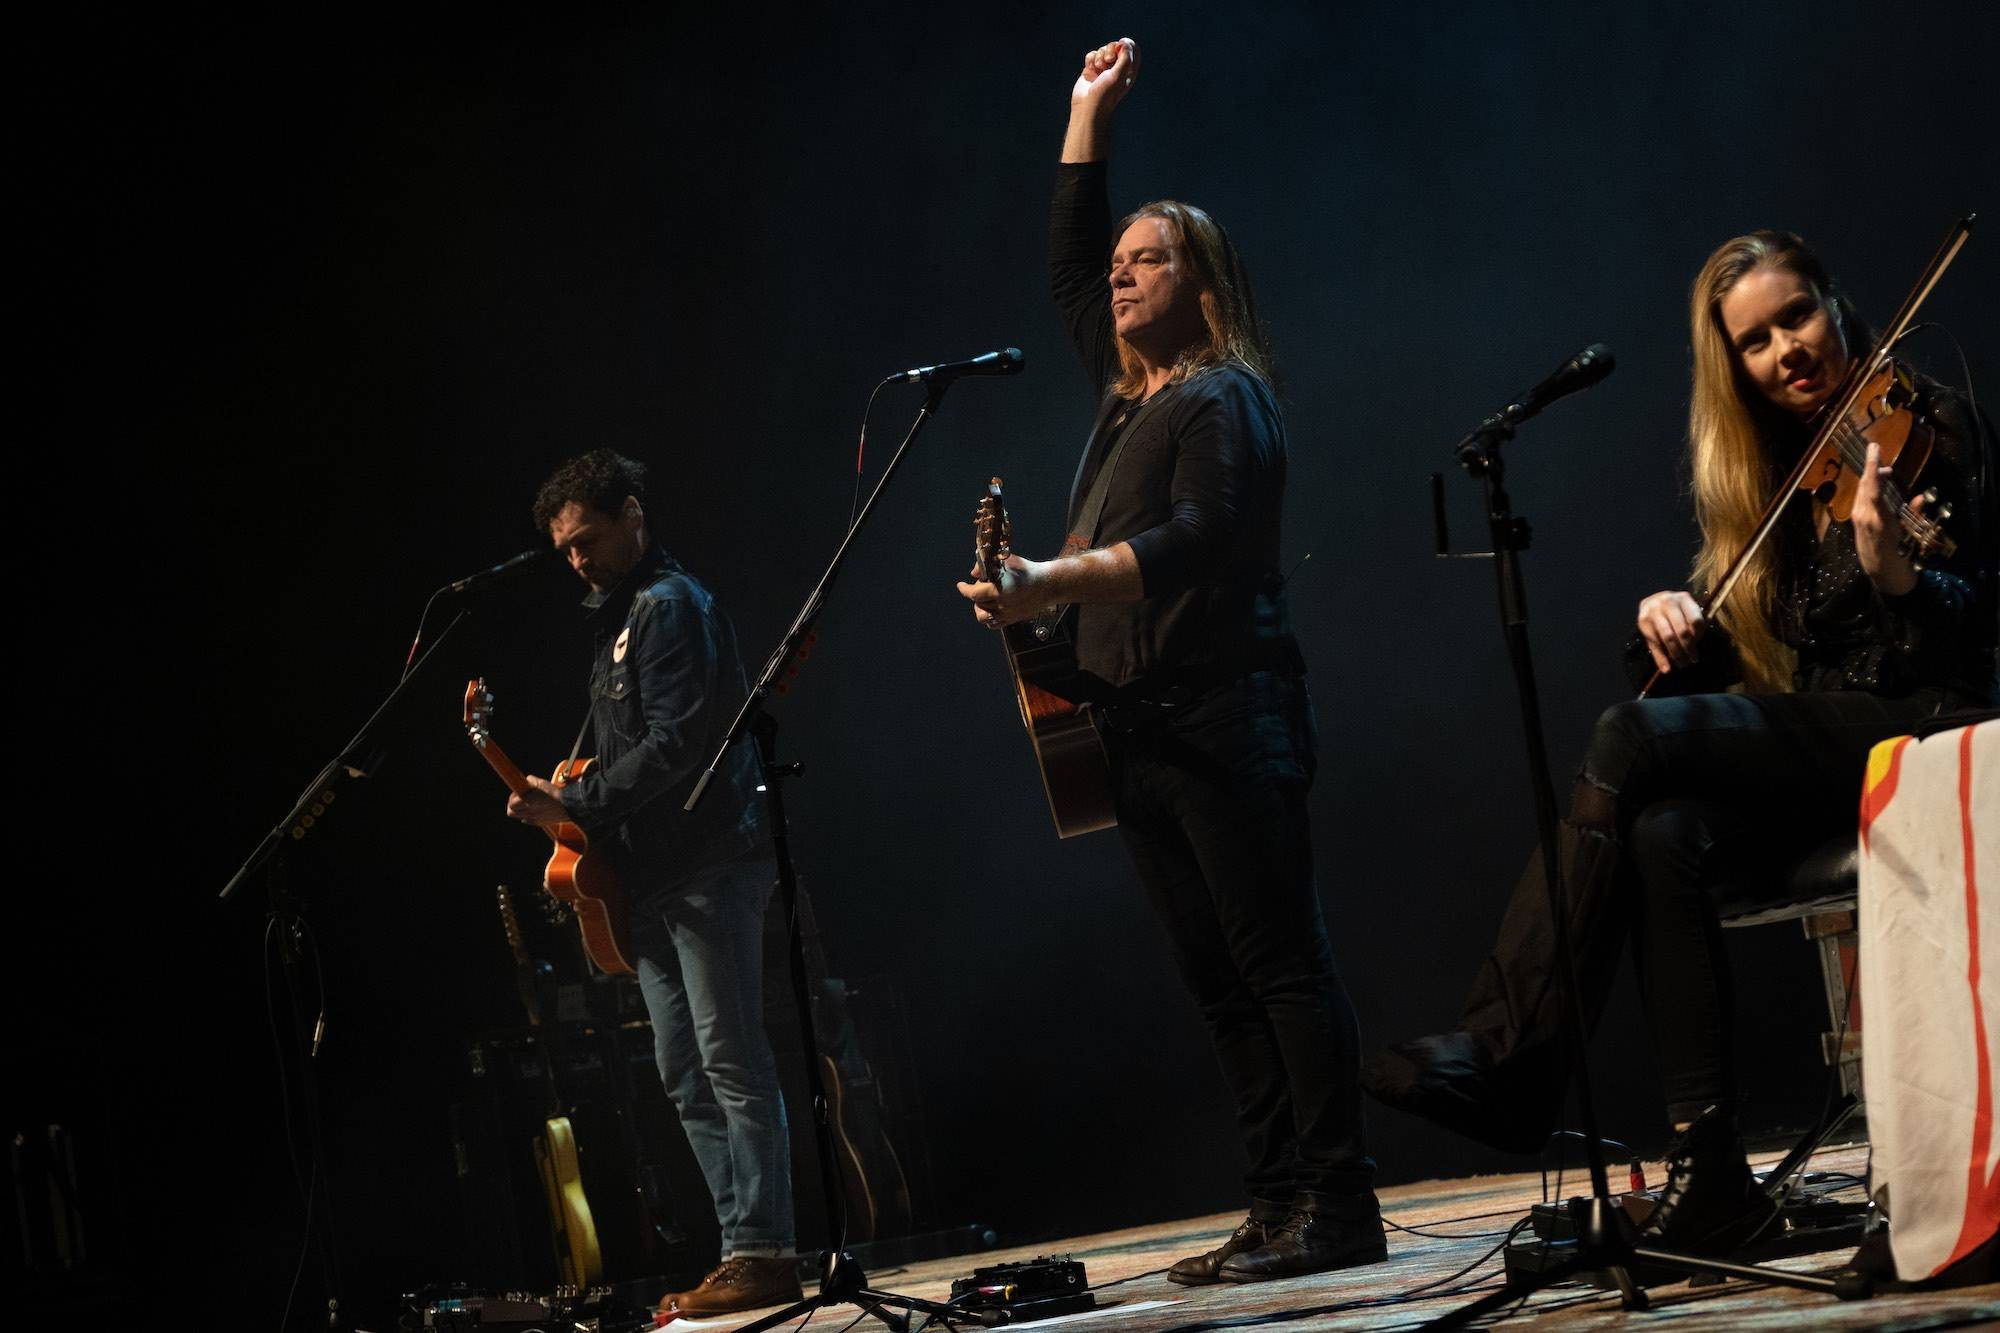 Alan Doyle at Queen Elizabeth Theatre, Vancouver, Mar 8, 2020. Scott Alexander photo.